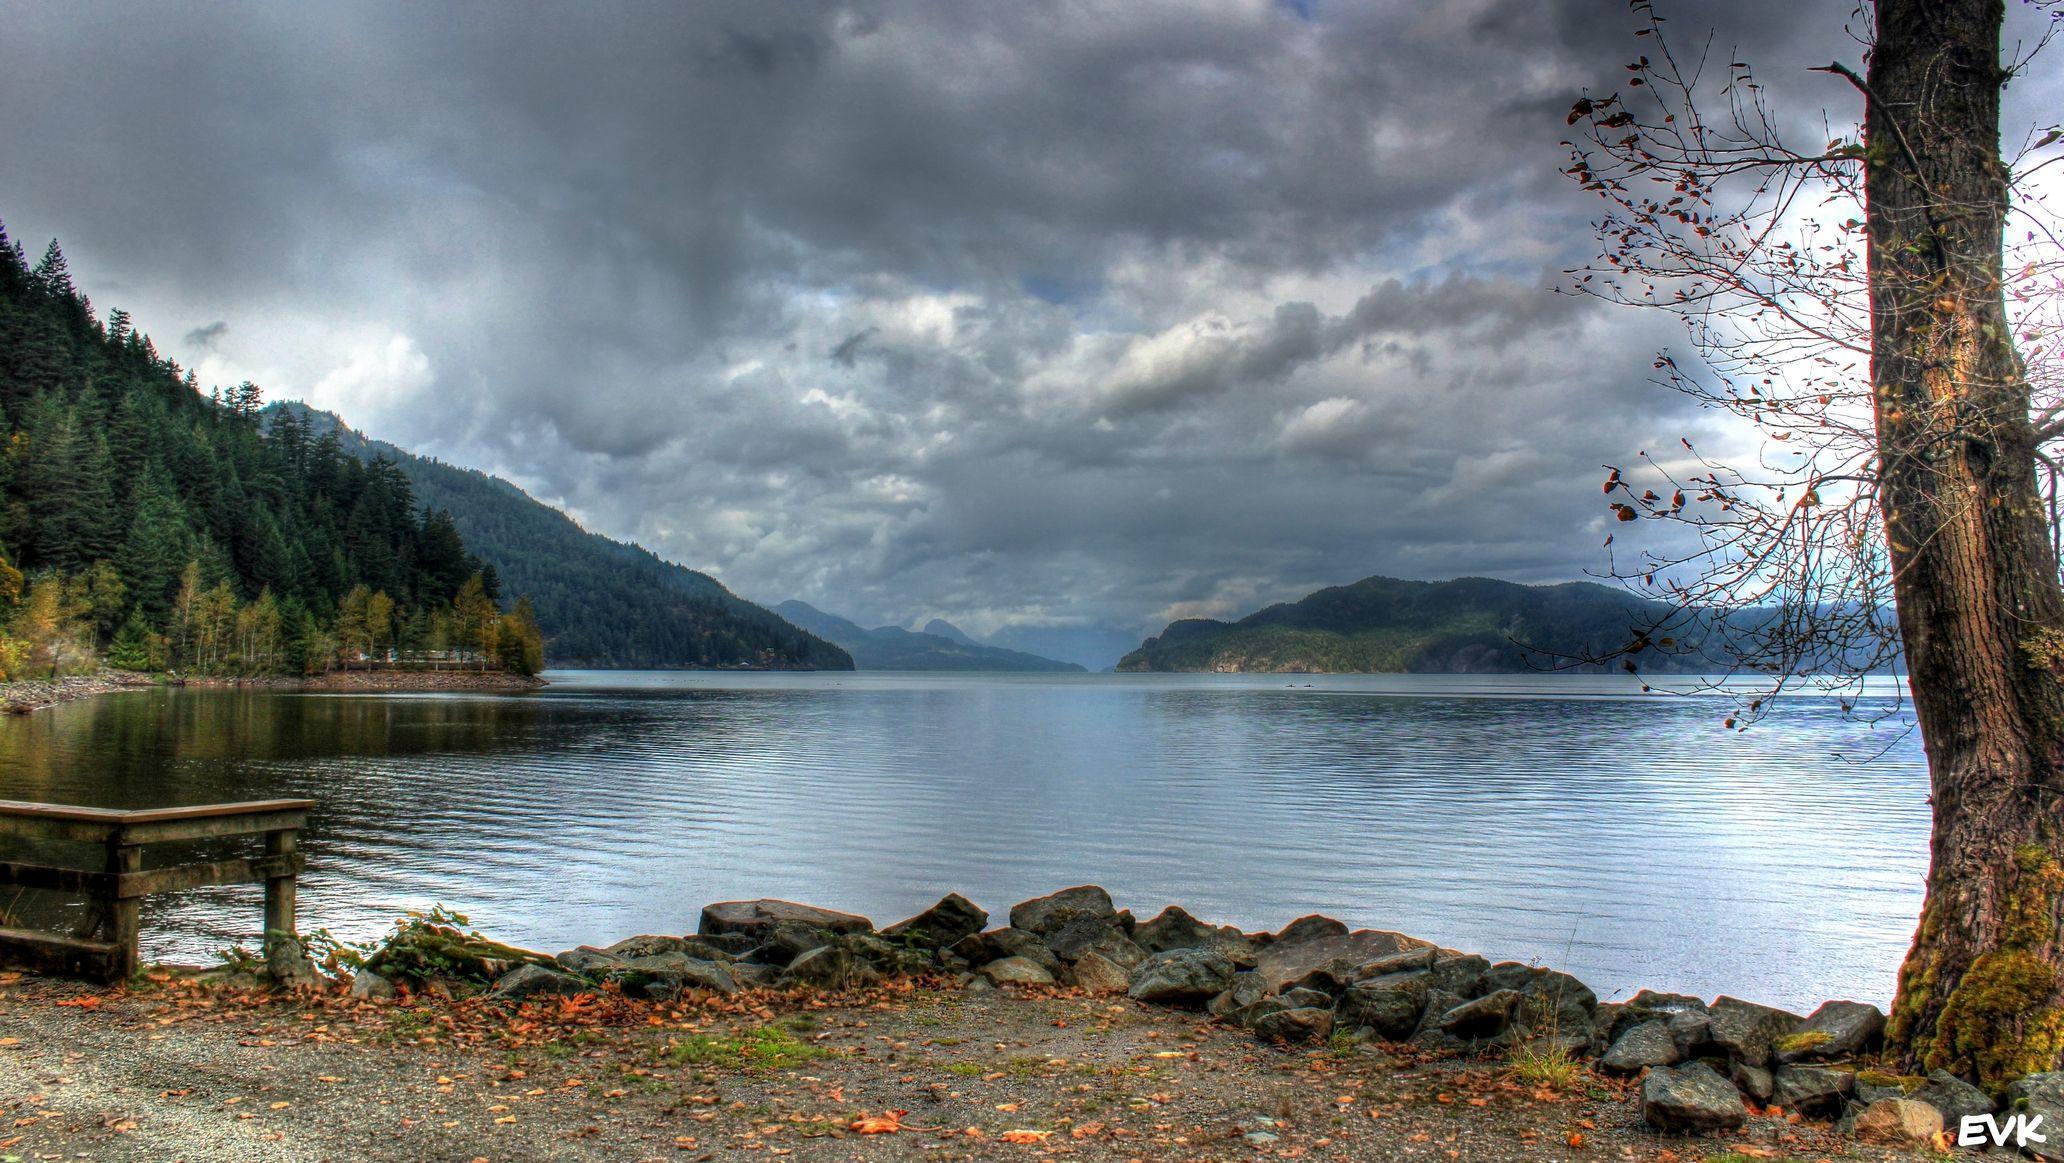 #scenery #harrison #lake #mountains Harrison Hot Springs